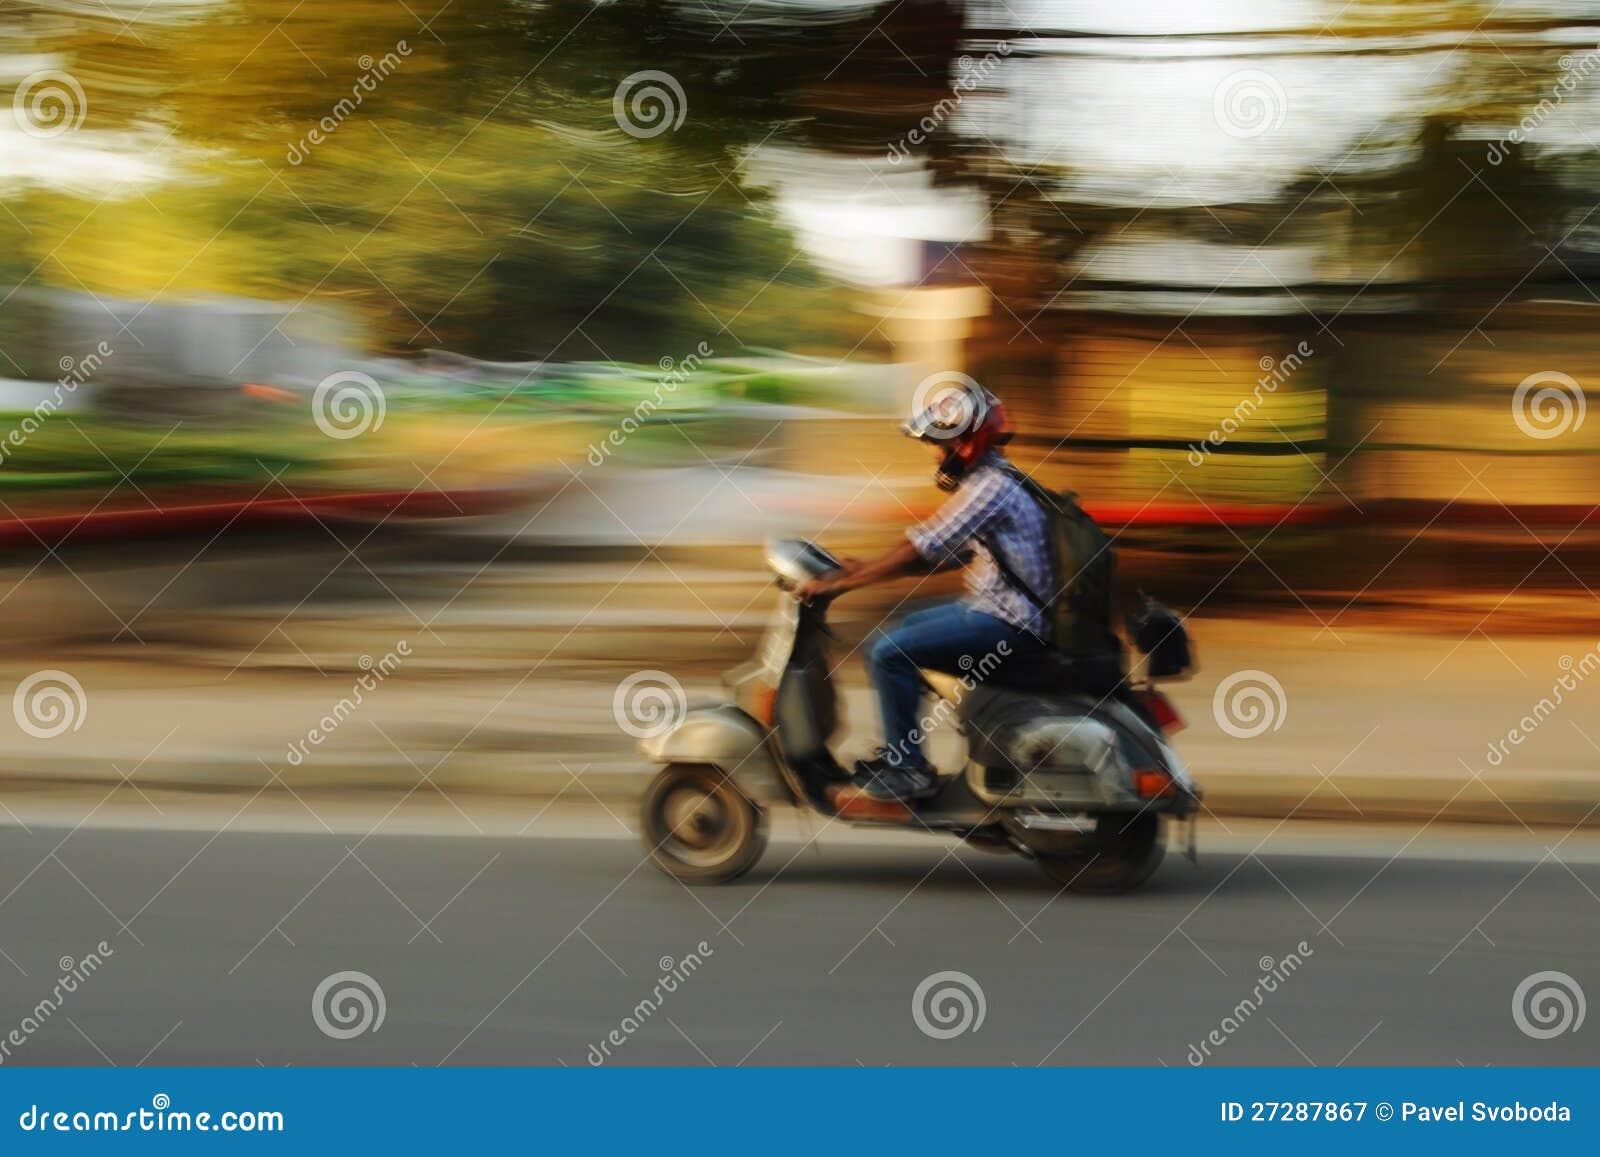 Moving motorbike, gammala Delhi, Indien